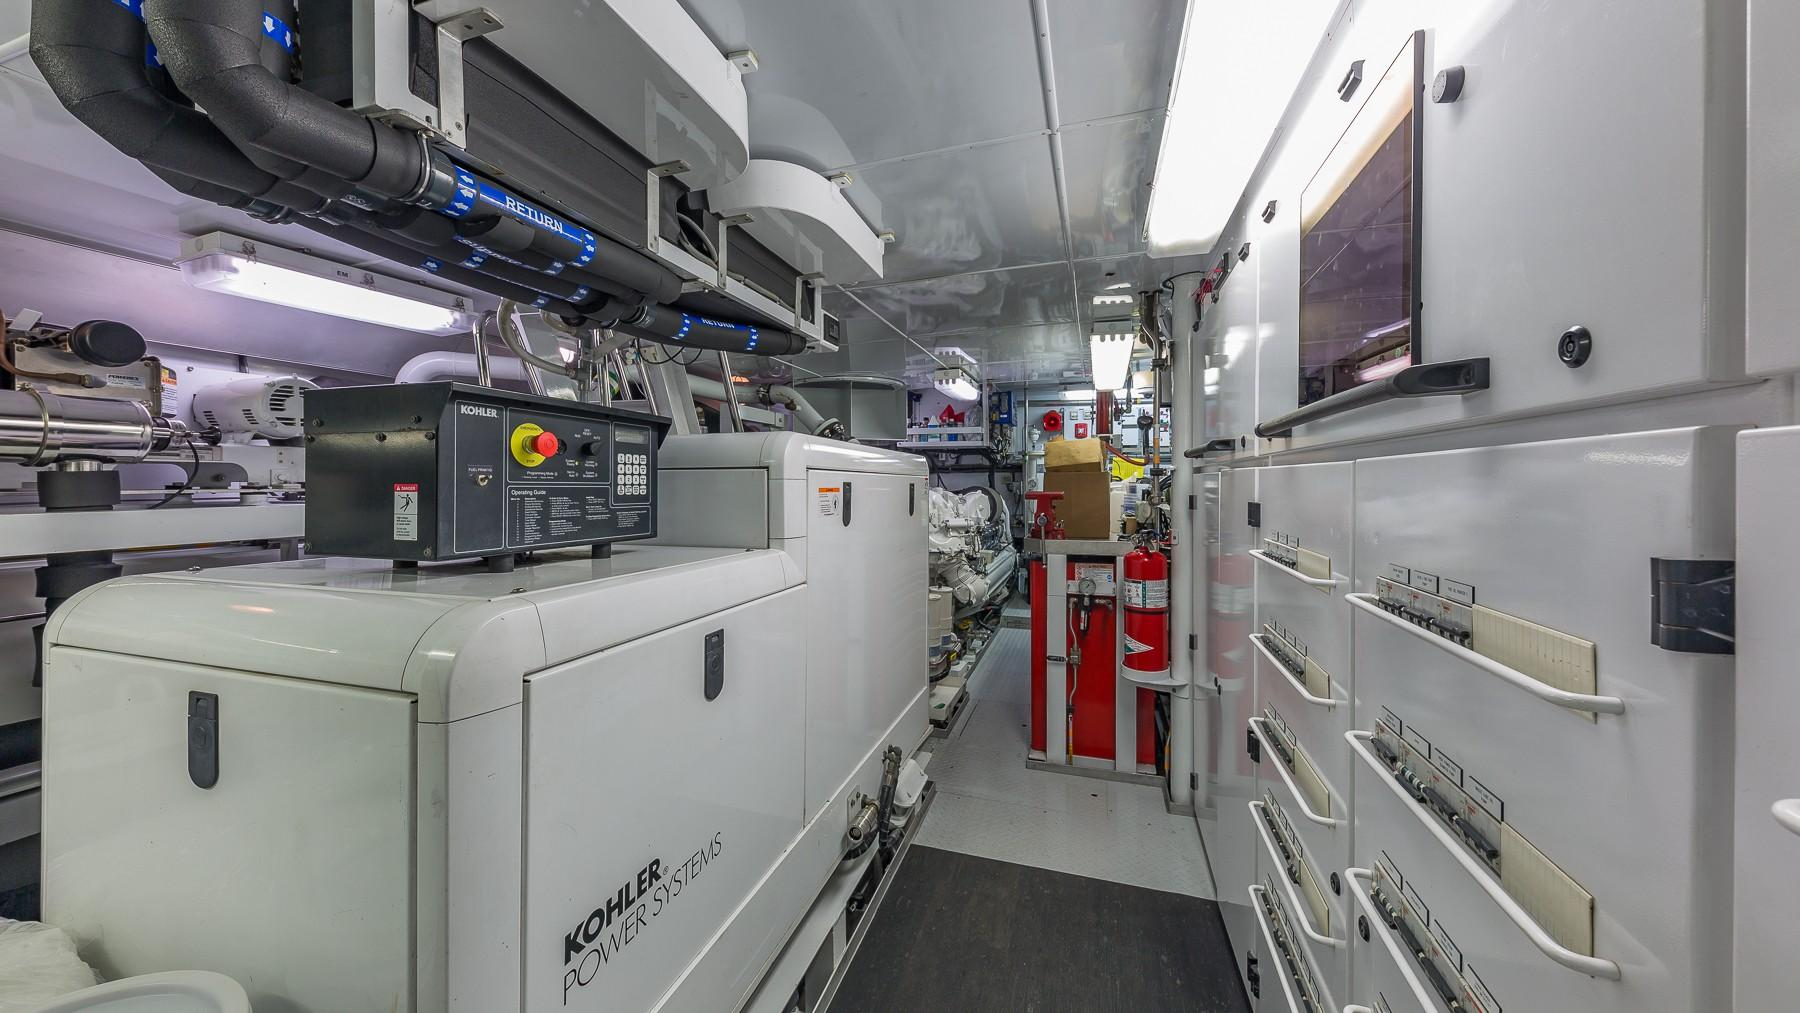 101 Burger Engine Room